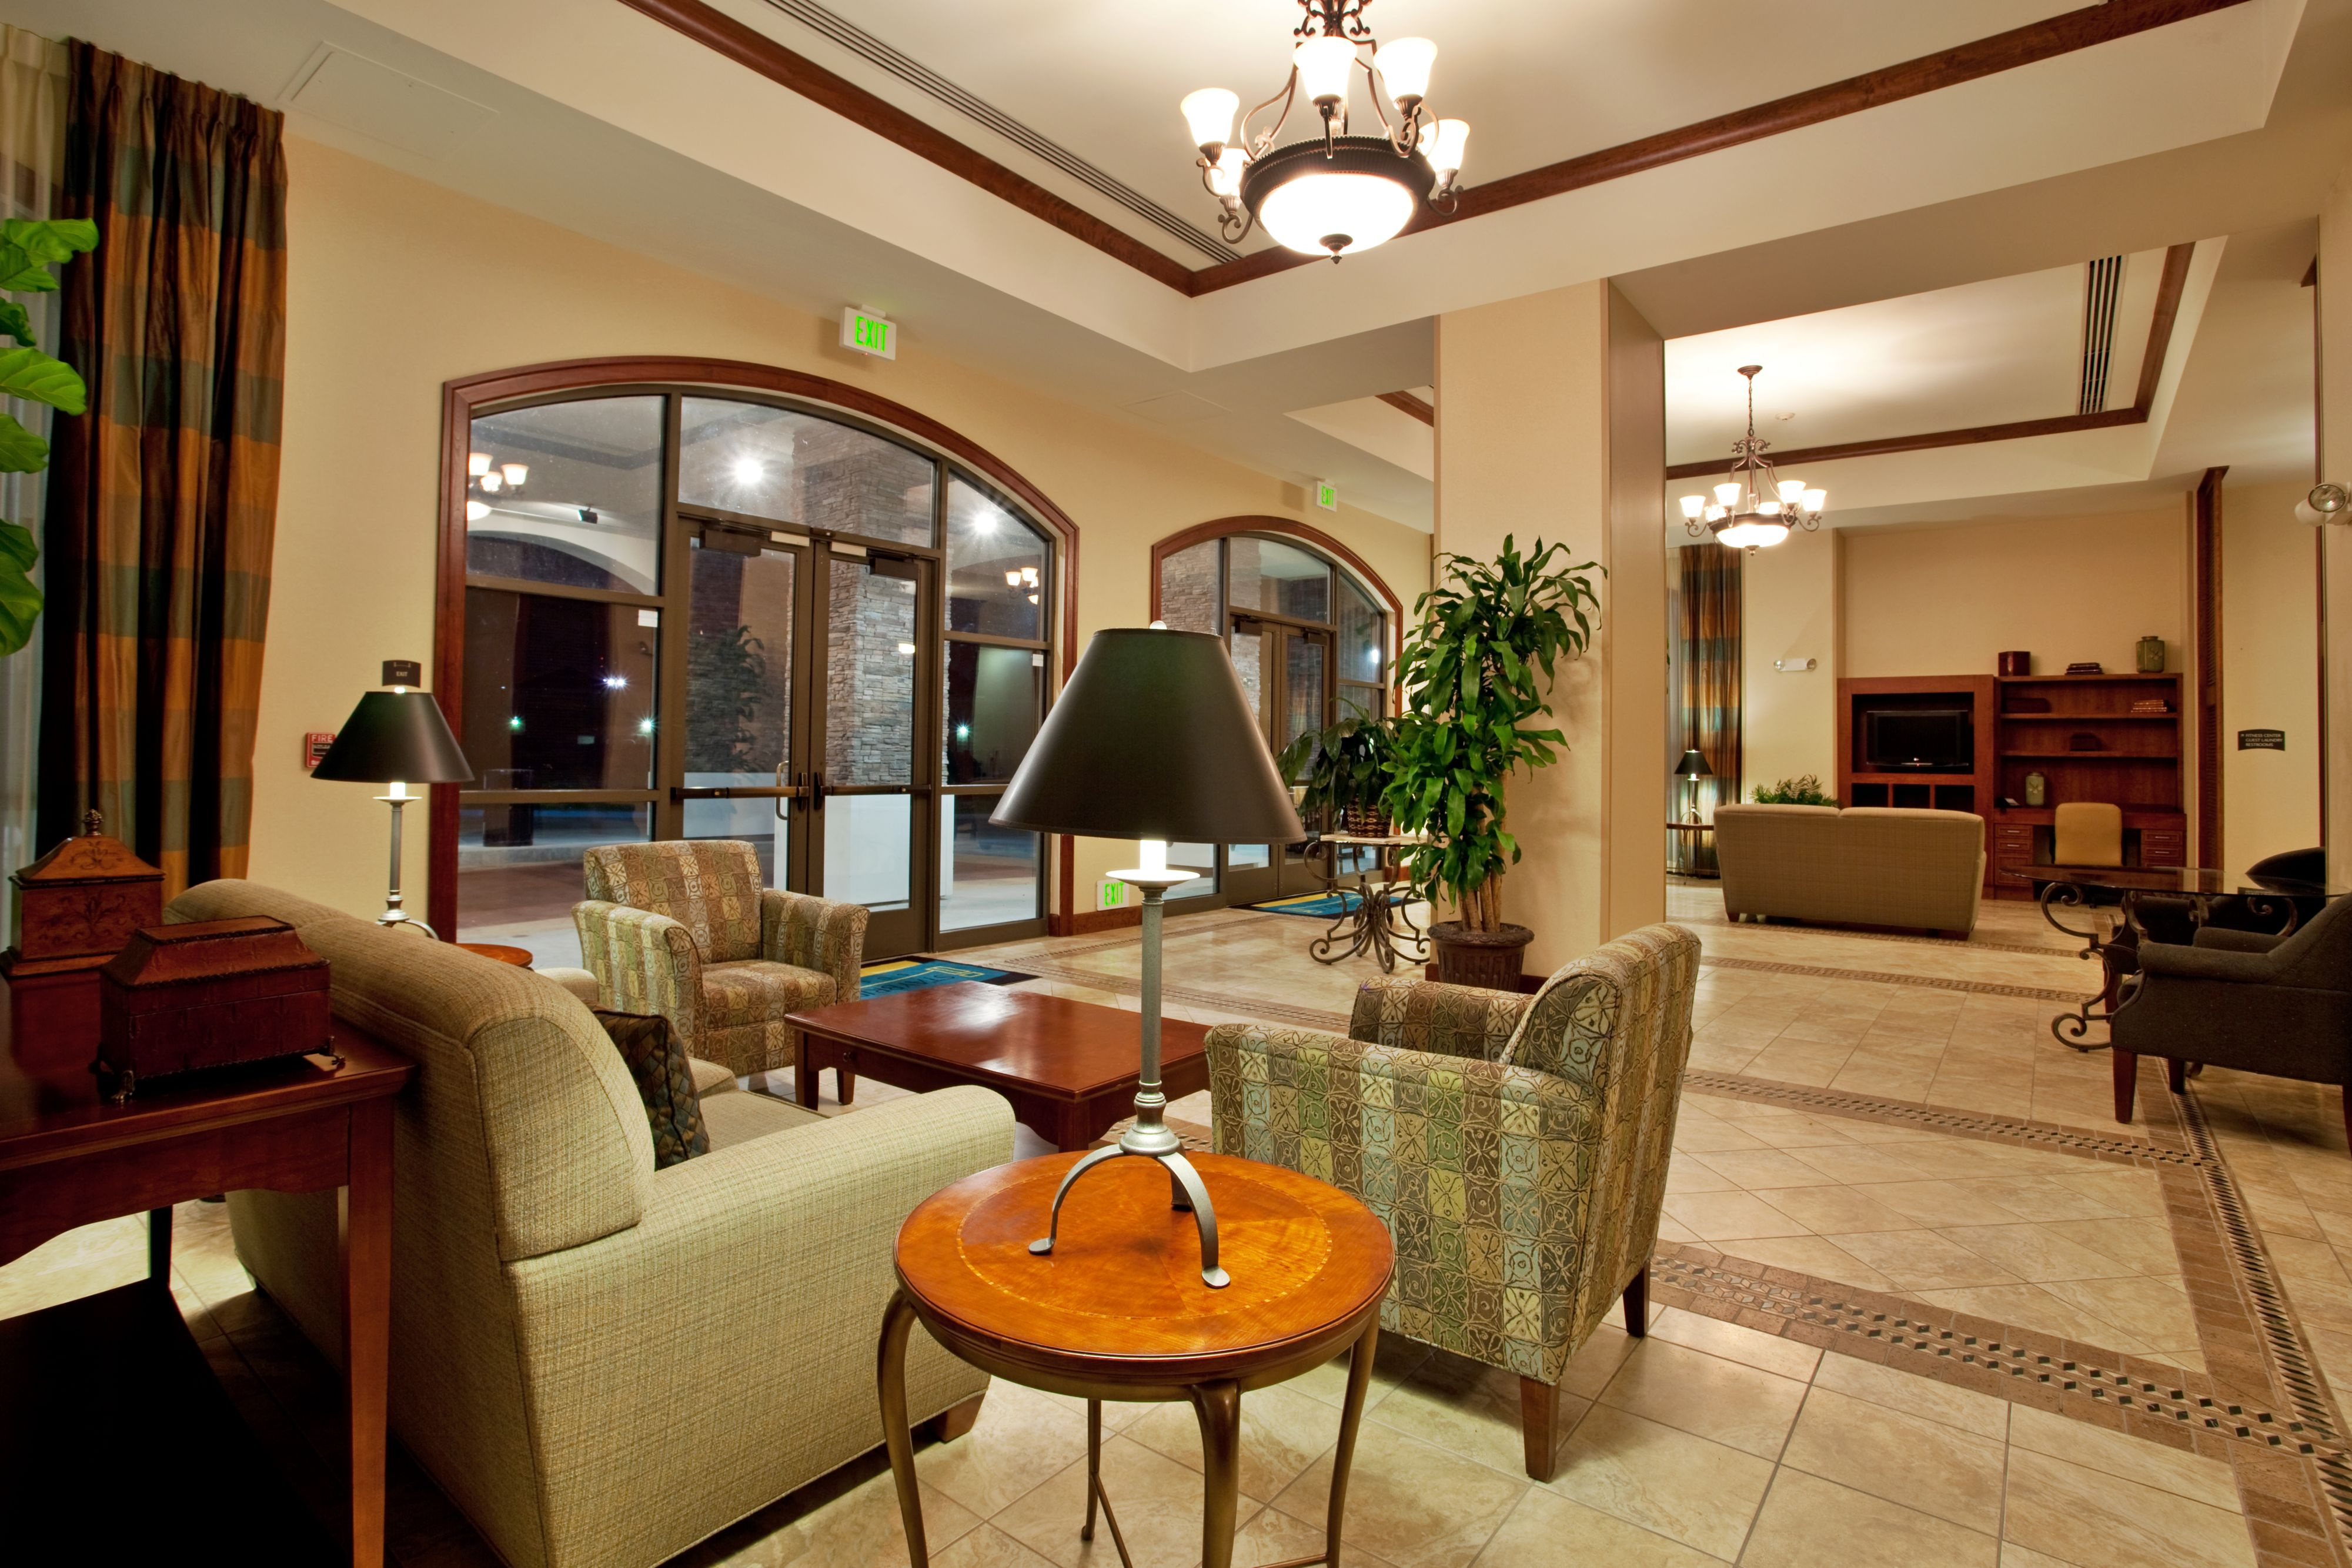 Hotels Baton Rouge Near Campus